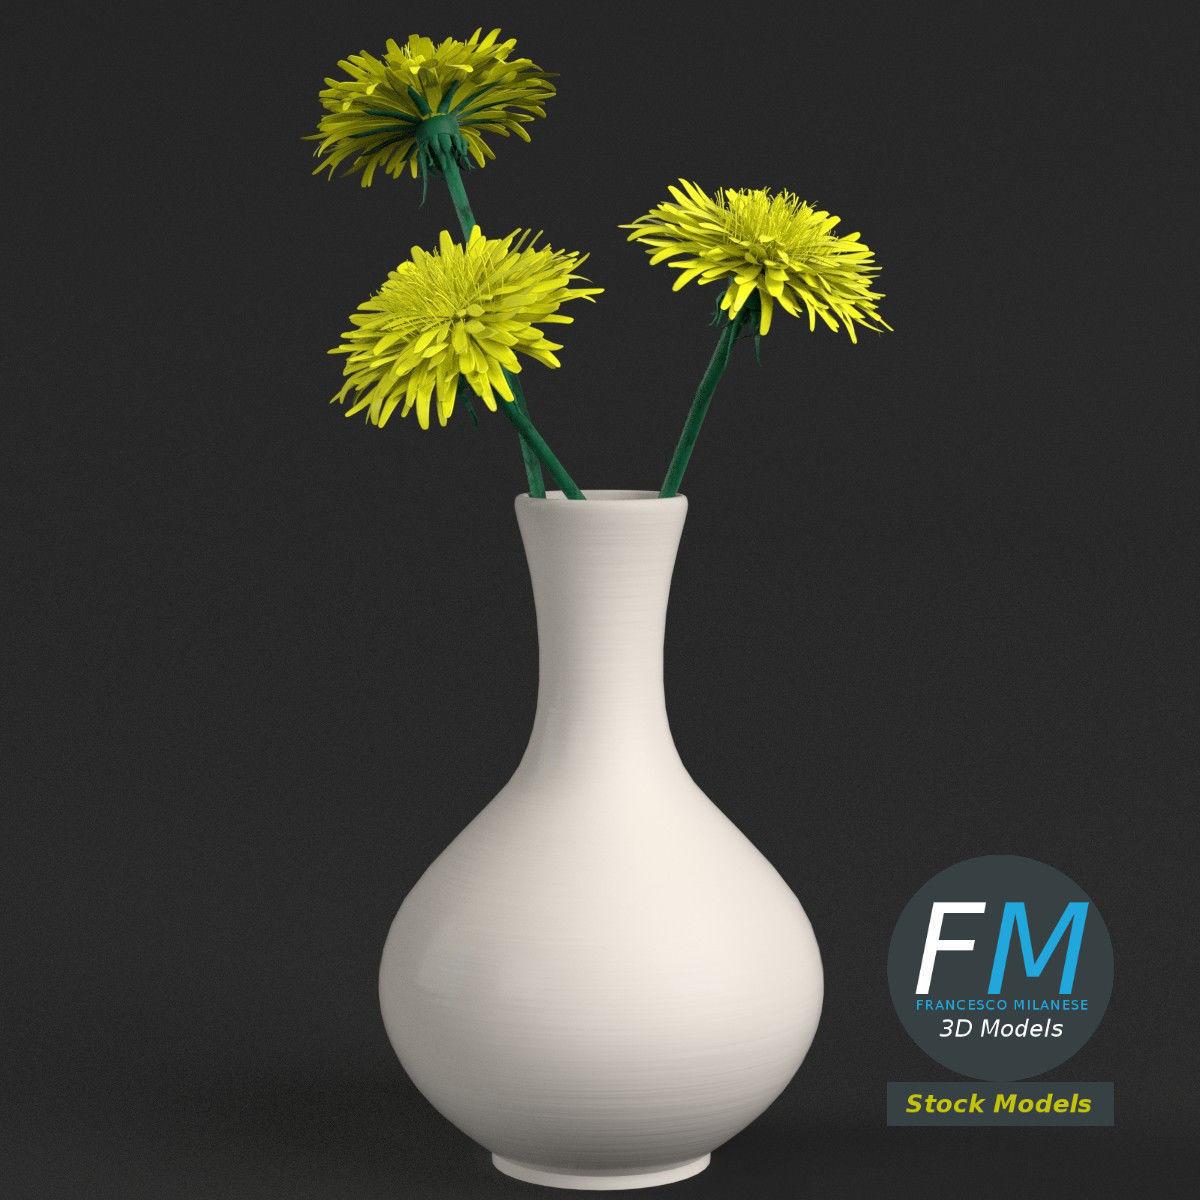 Dandelion flowers in a vase